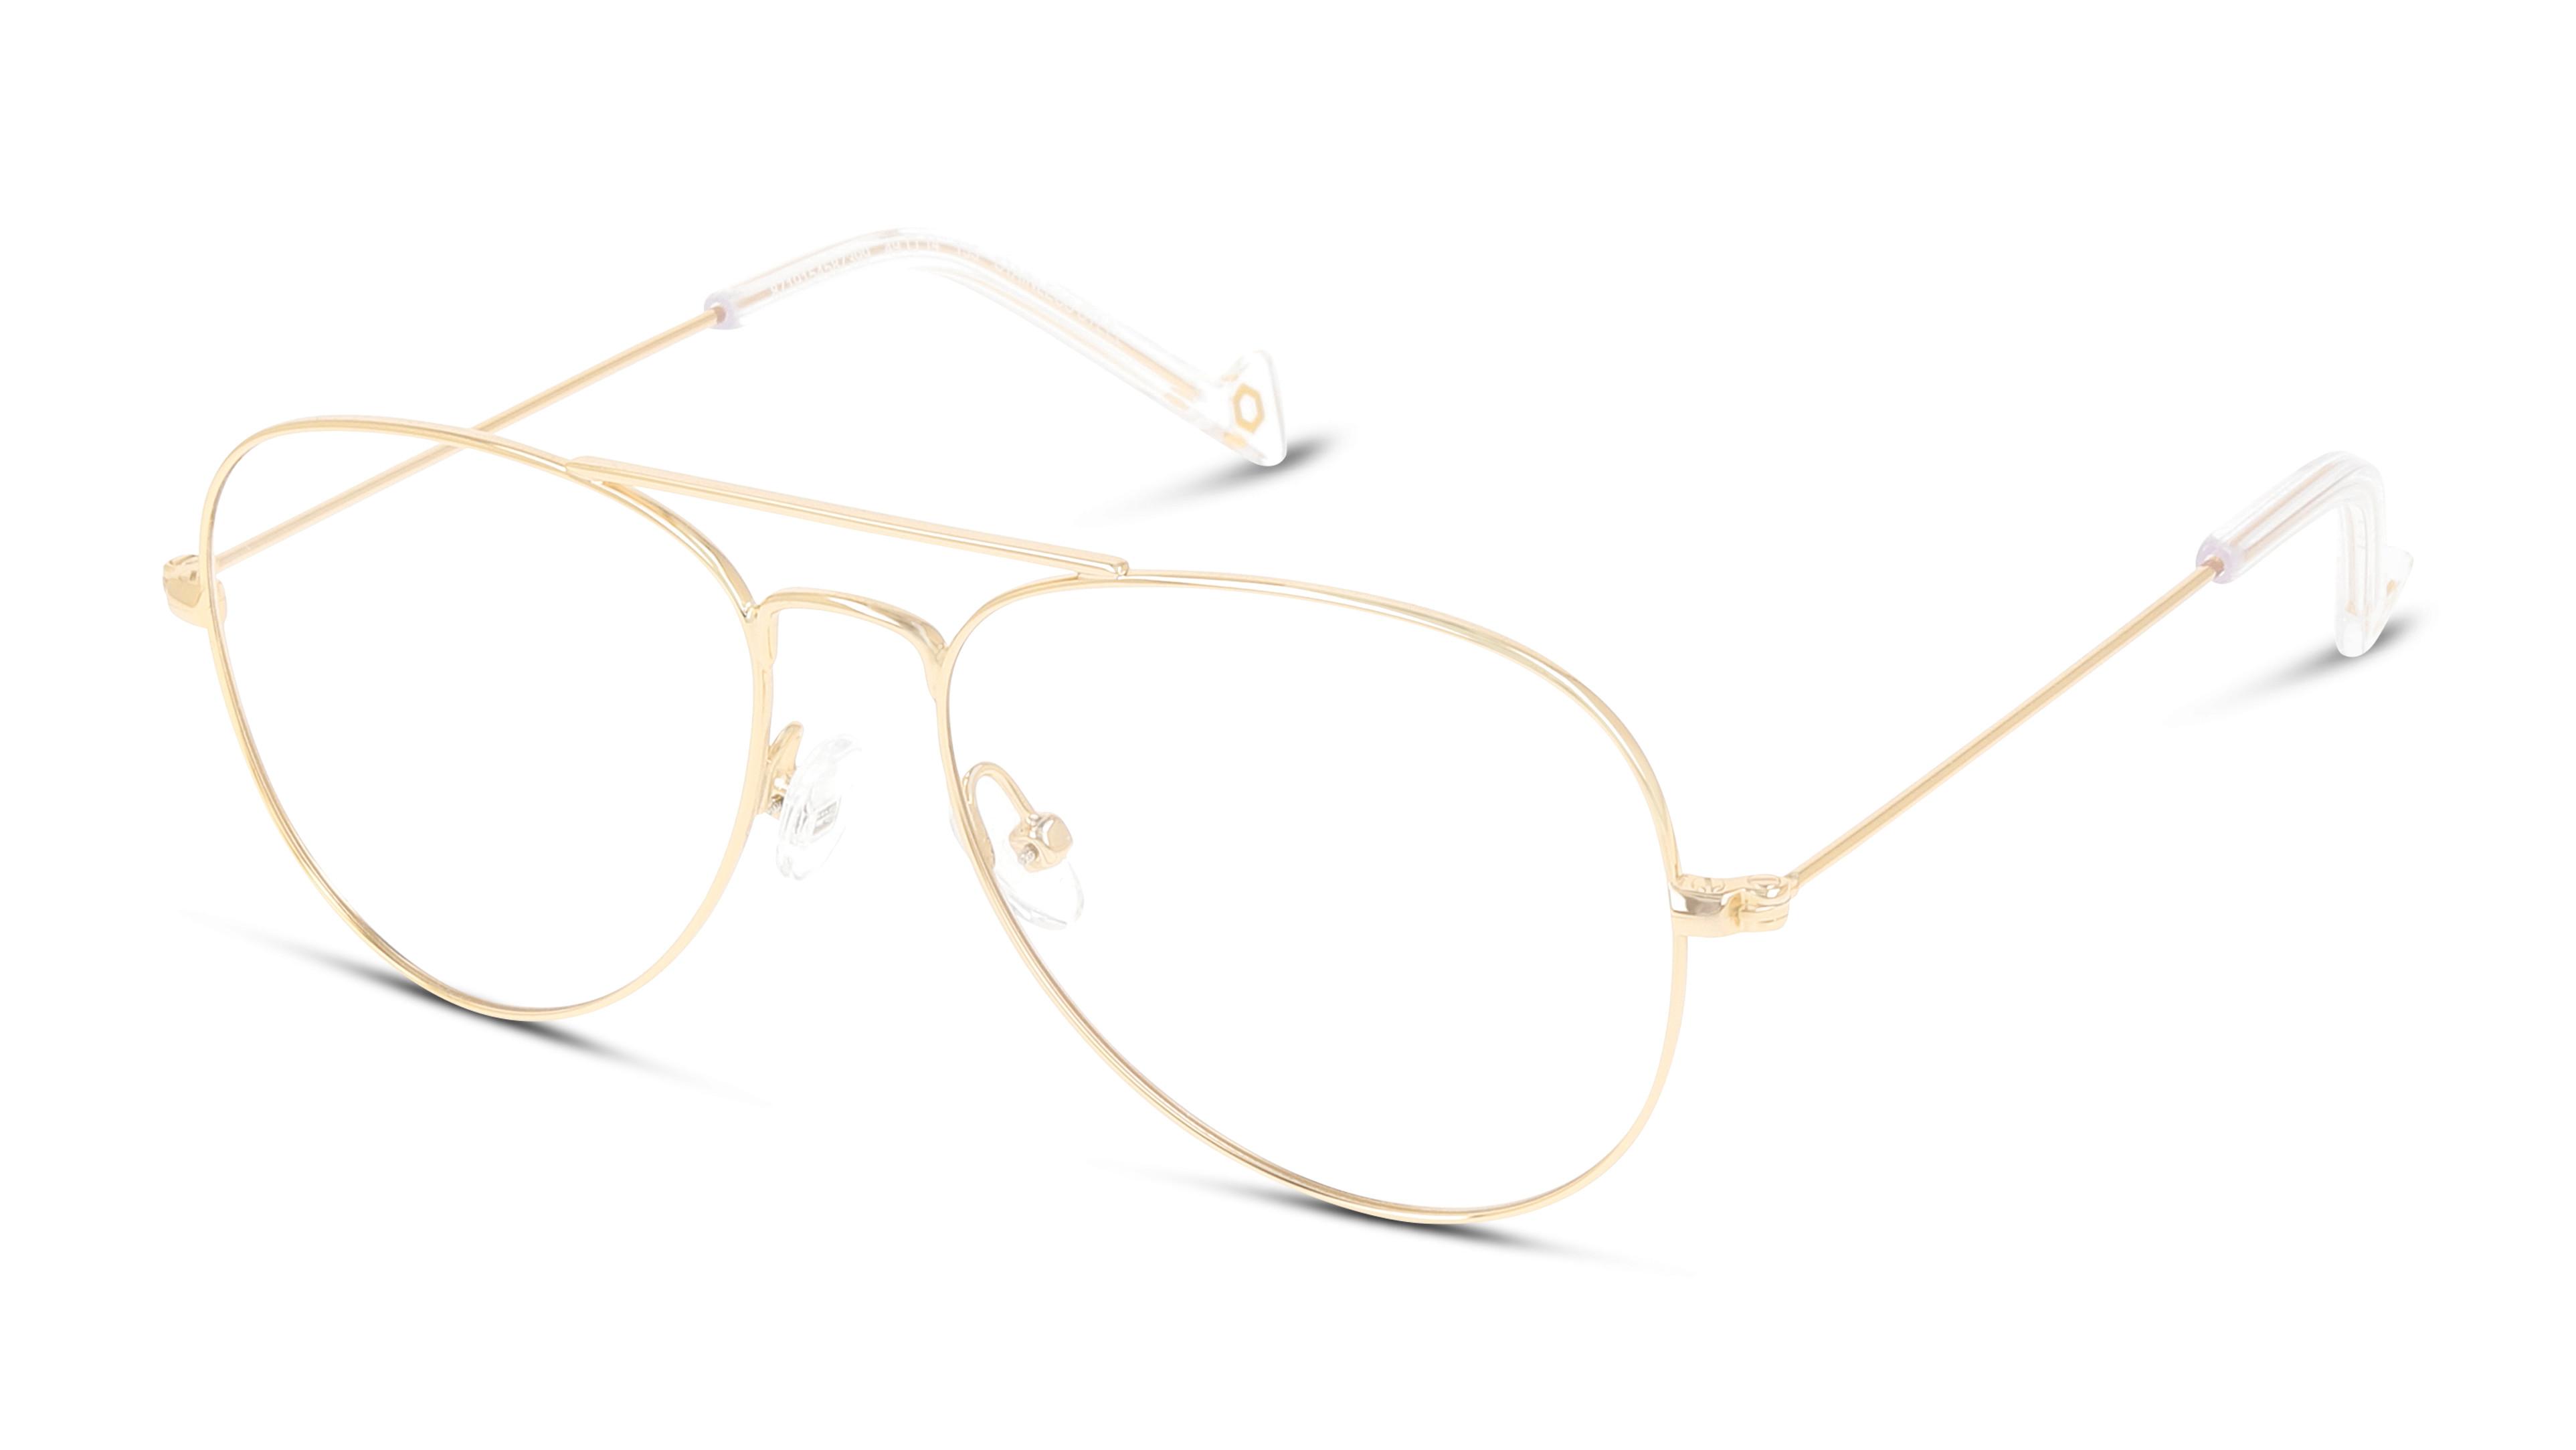 8719154587399-angle-03-in-style-iskt02-eyewear-gold